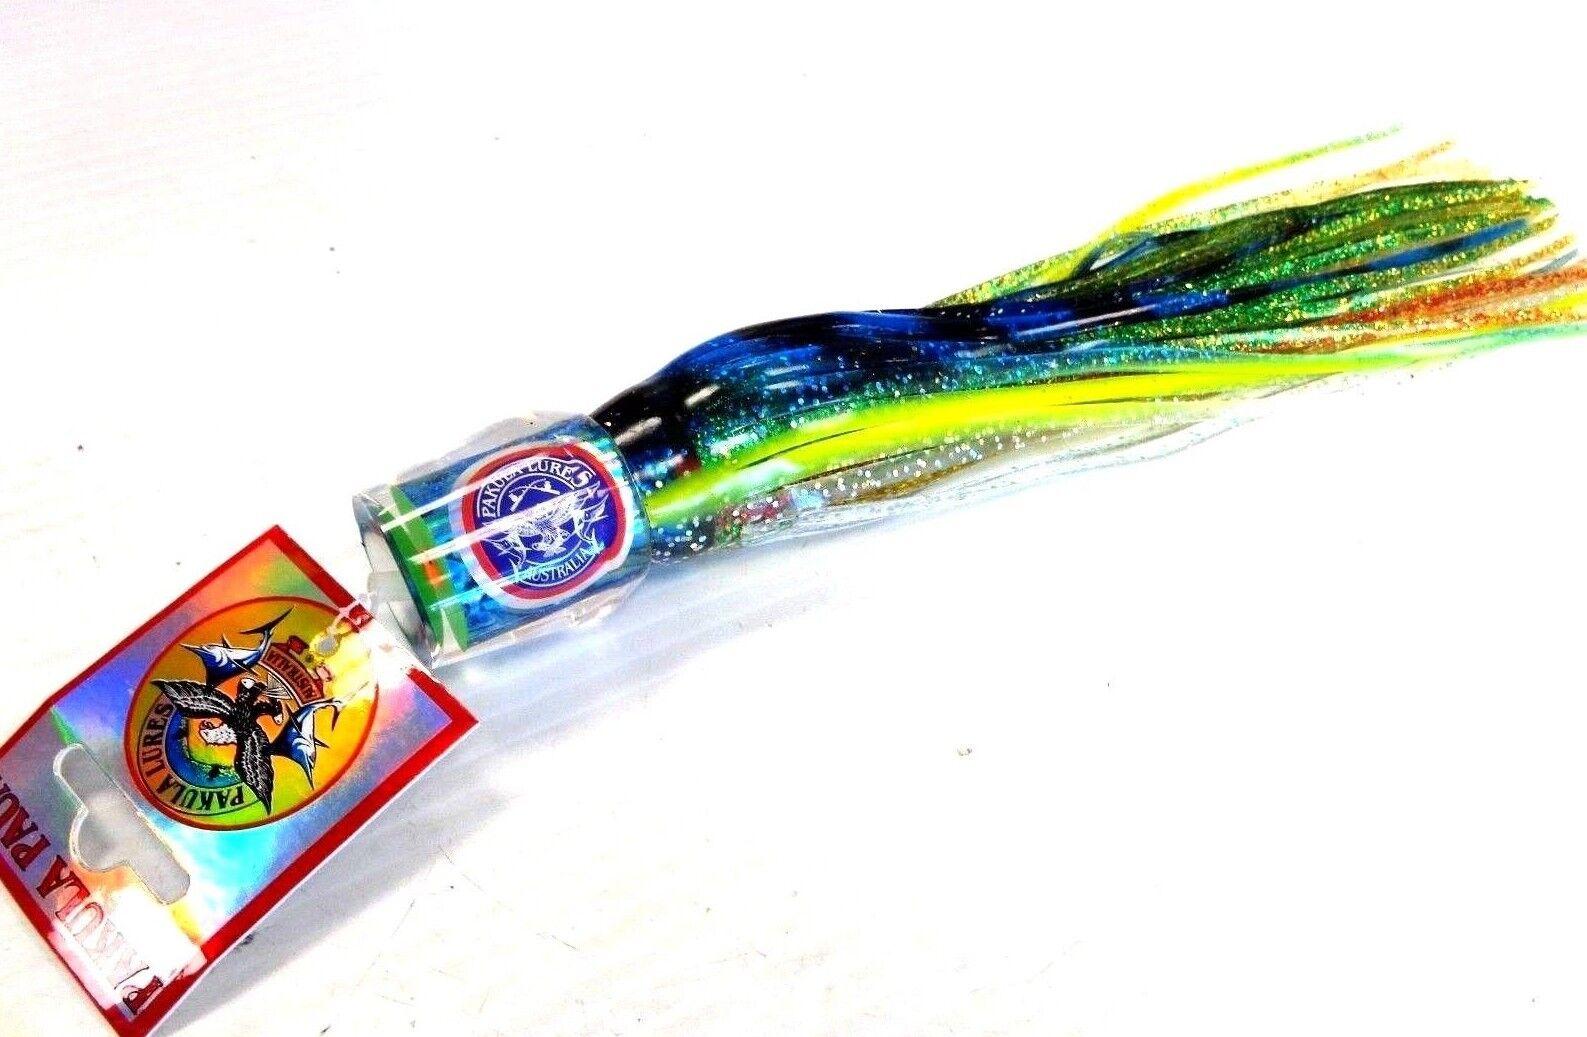 Pakula Mouse Hothead Big Game Trolling Lure - blueE ANGEL  - PDR035BA - Glow  on sale 70% off